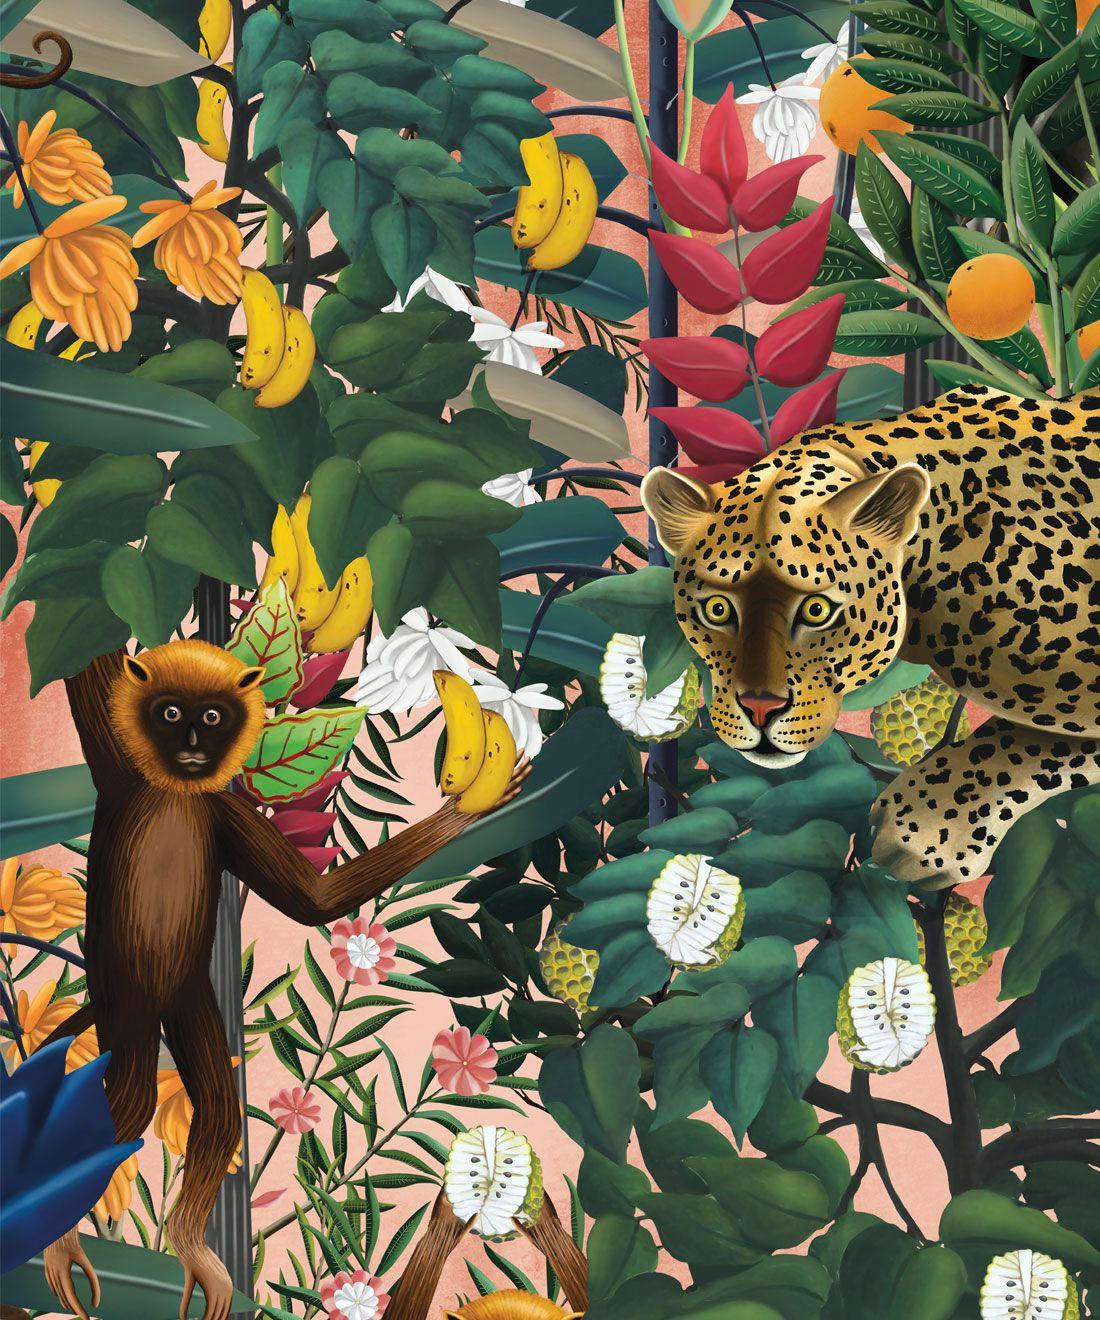 The Jungle Wallpaper • Animal Wallpaper • Botanical Wallpaper • Coral Wallpaper • Swatch